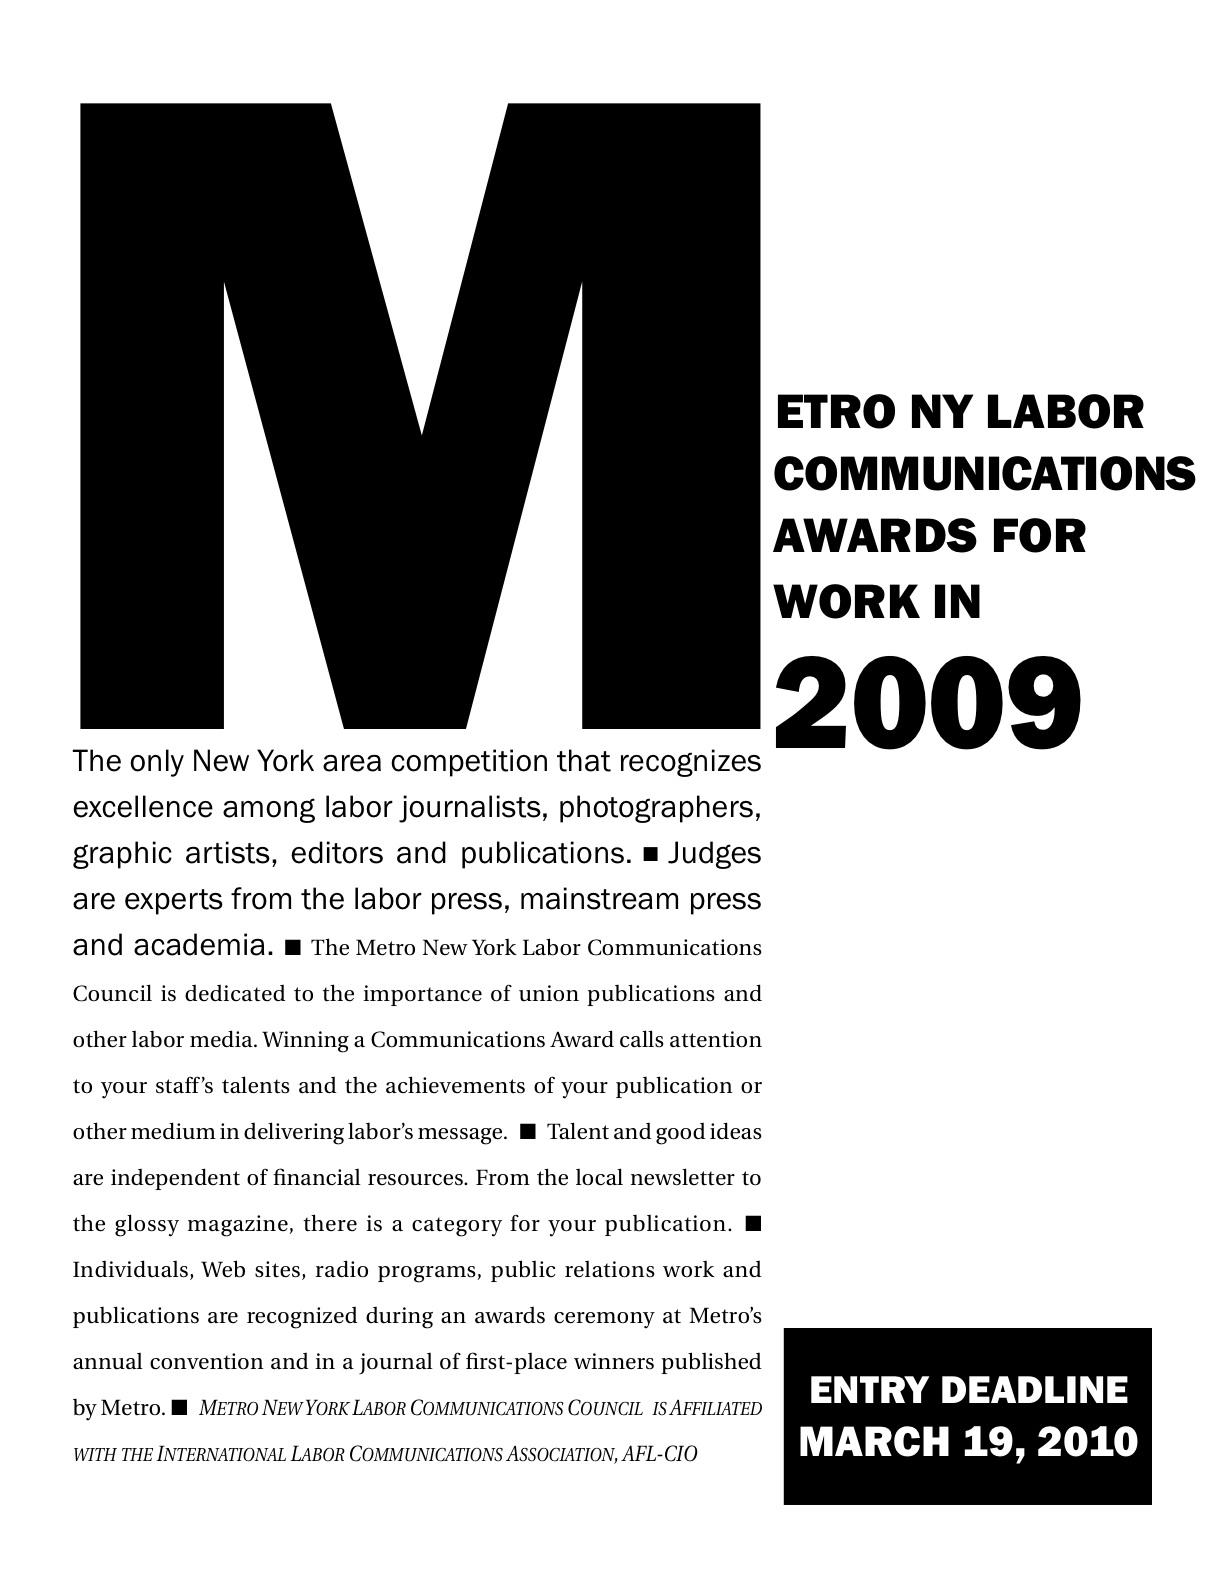 https://metrolabornyc.org/wp-content/uploads/Callforentries010_2-1.pdf